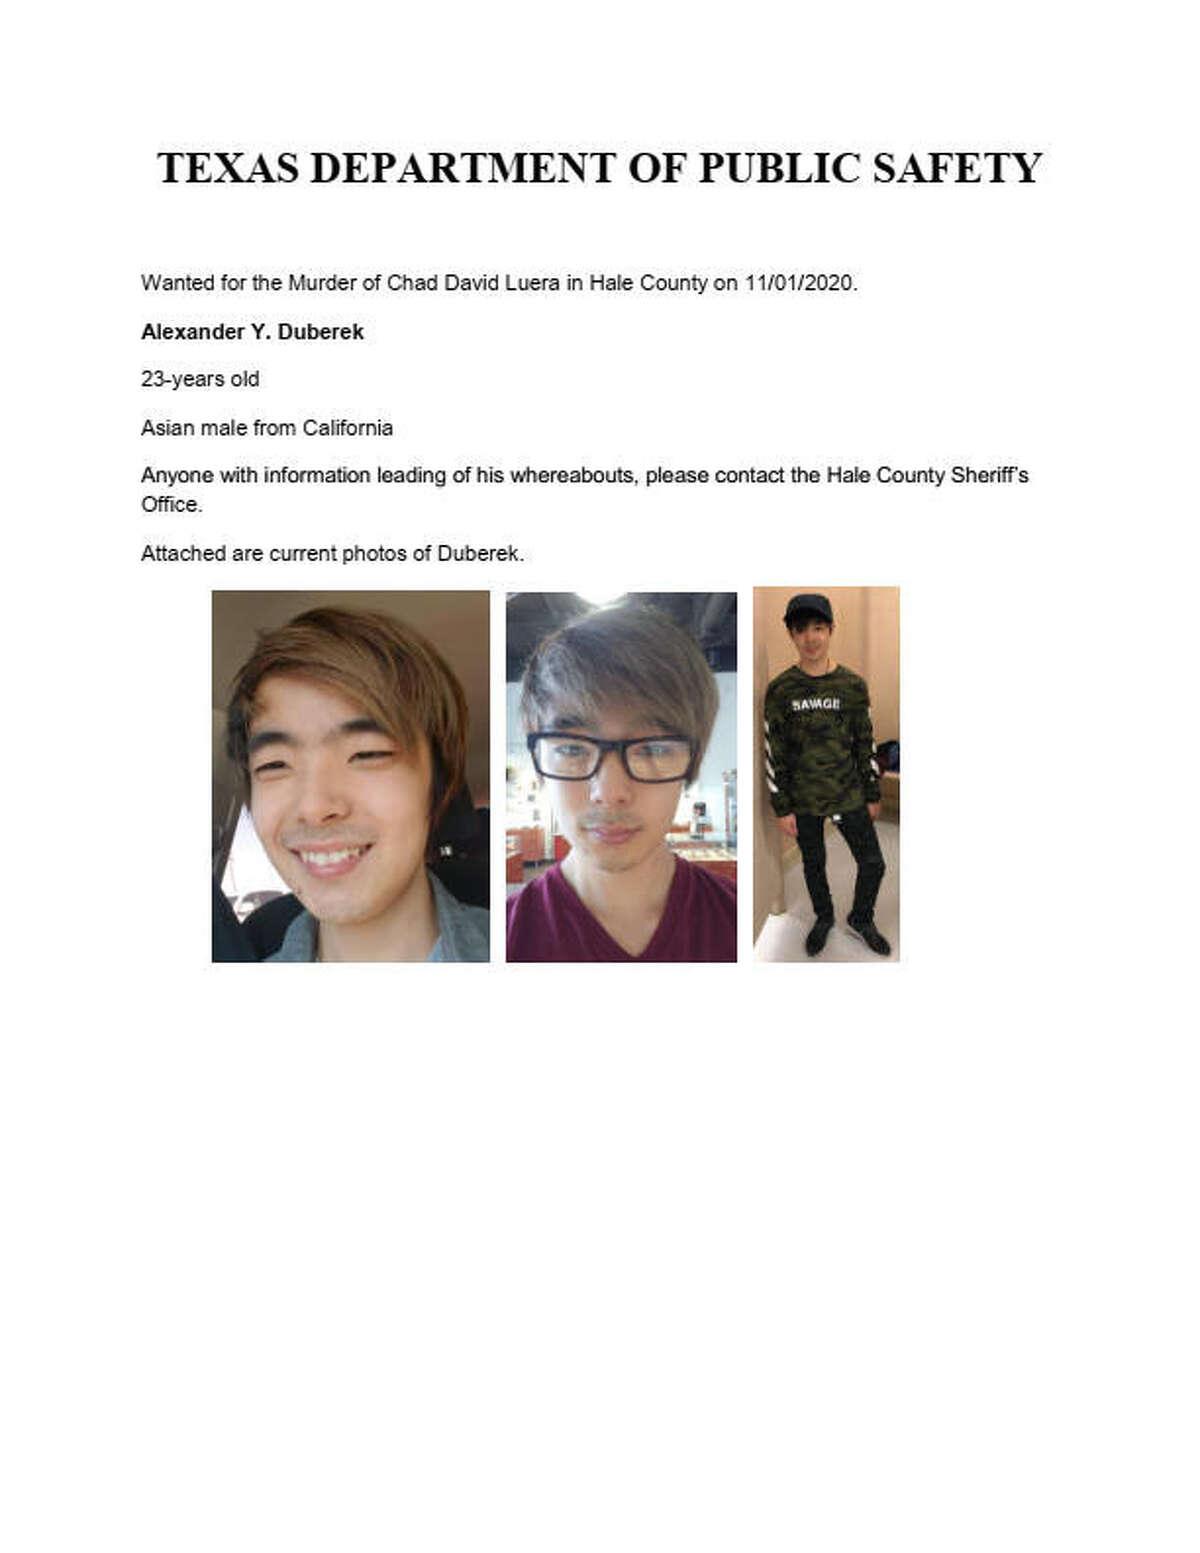 Wanted poster for Alexander Y. Duberek.